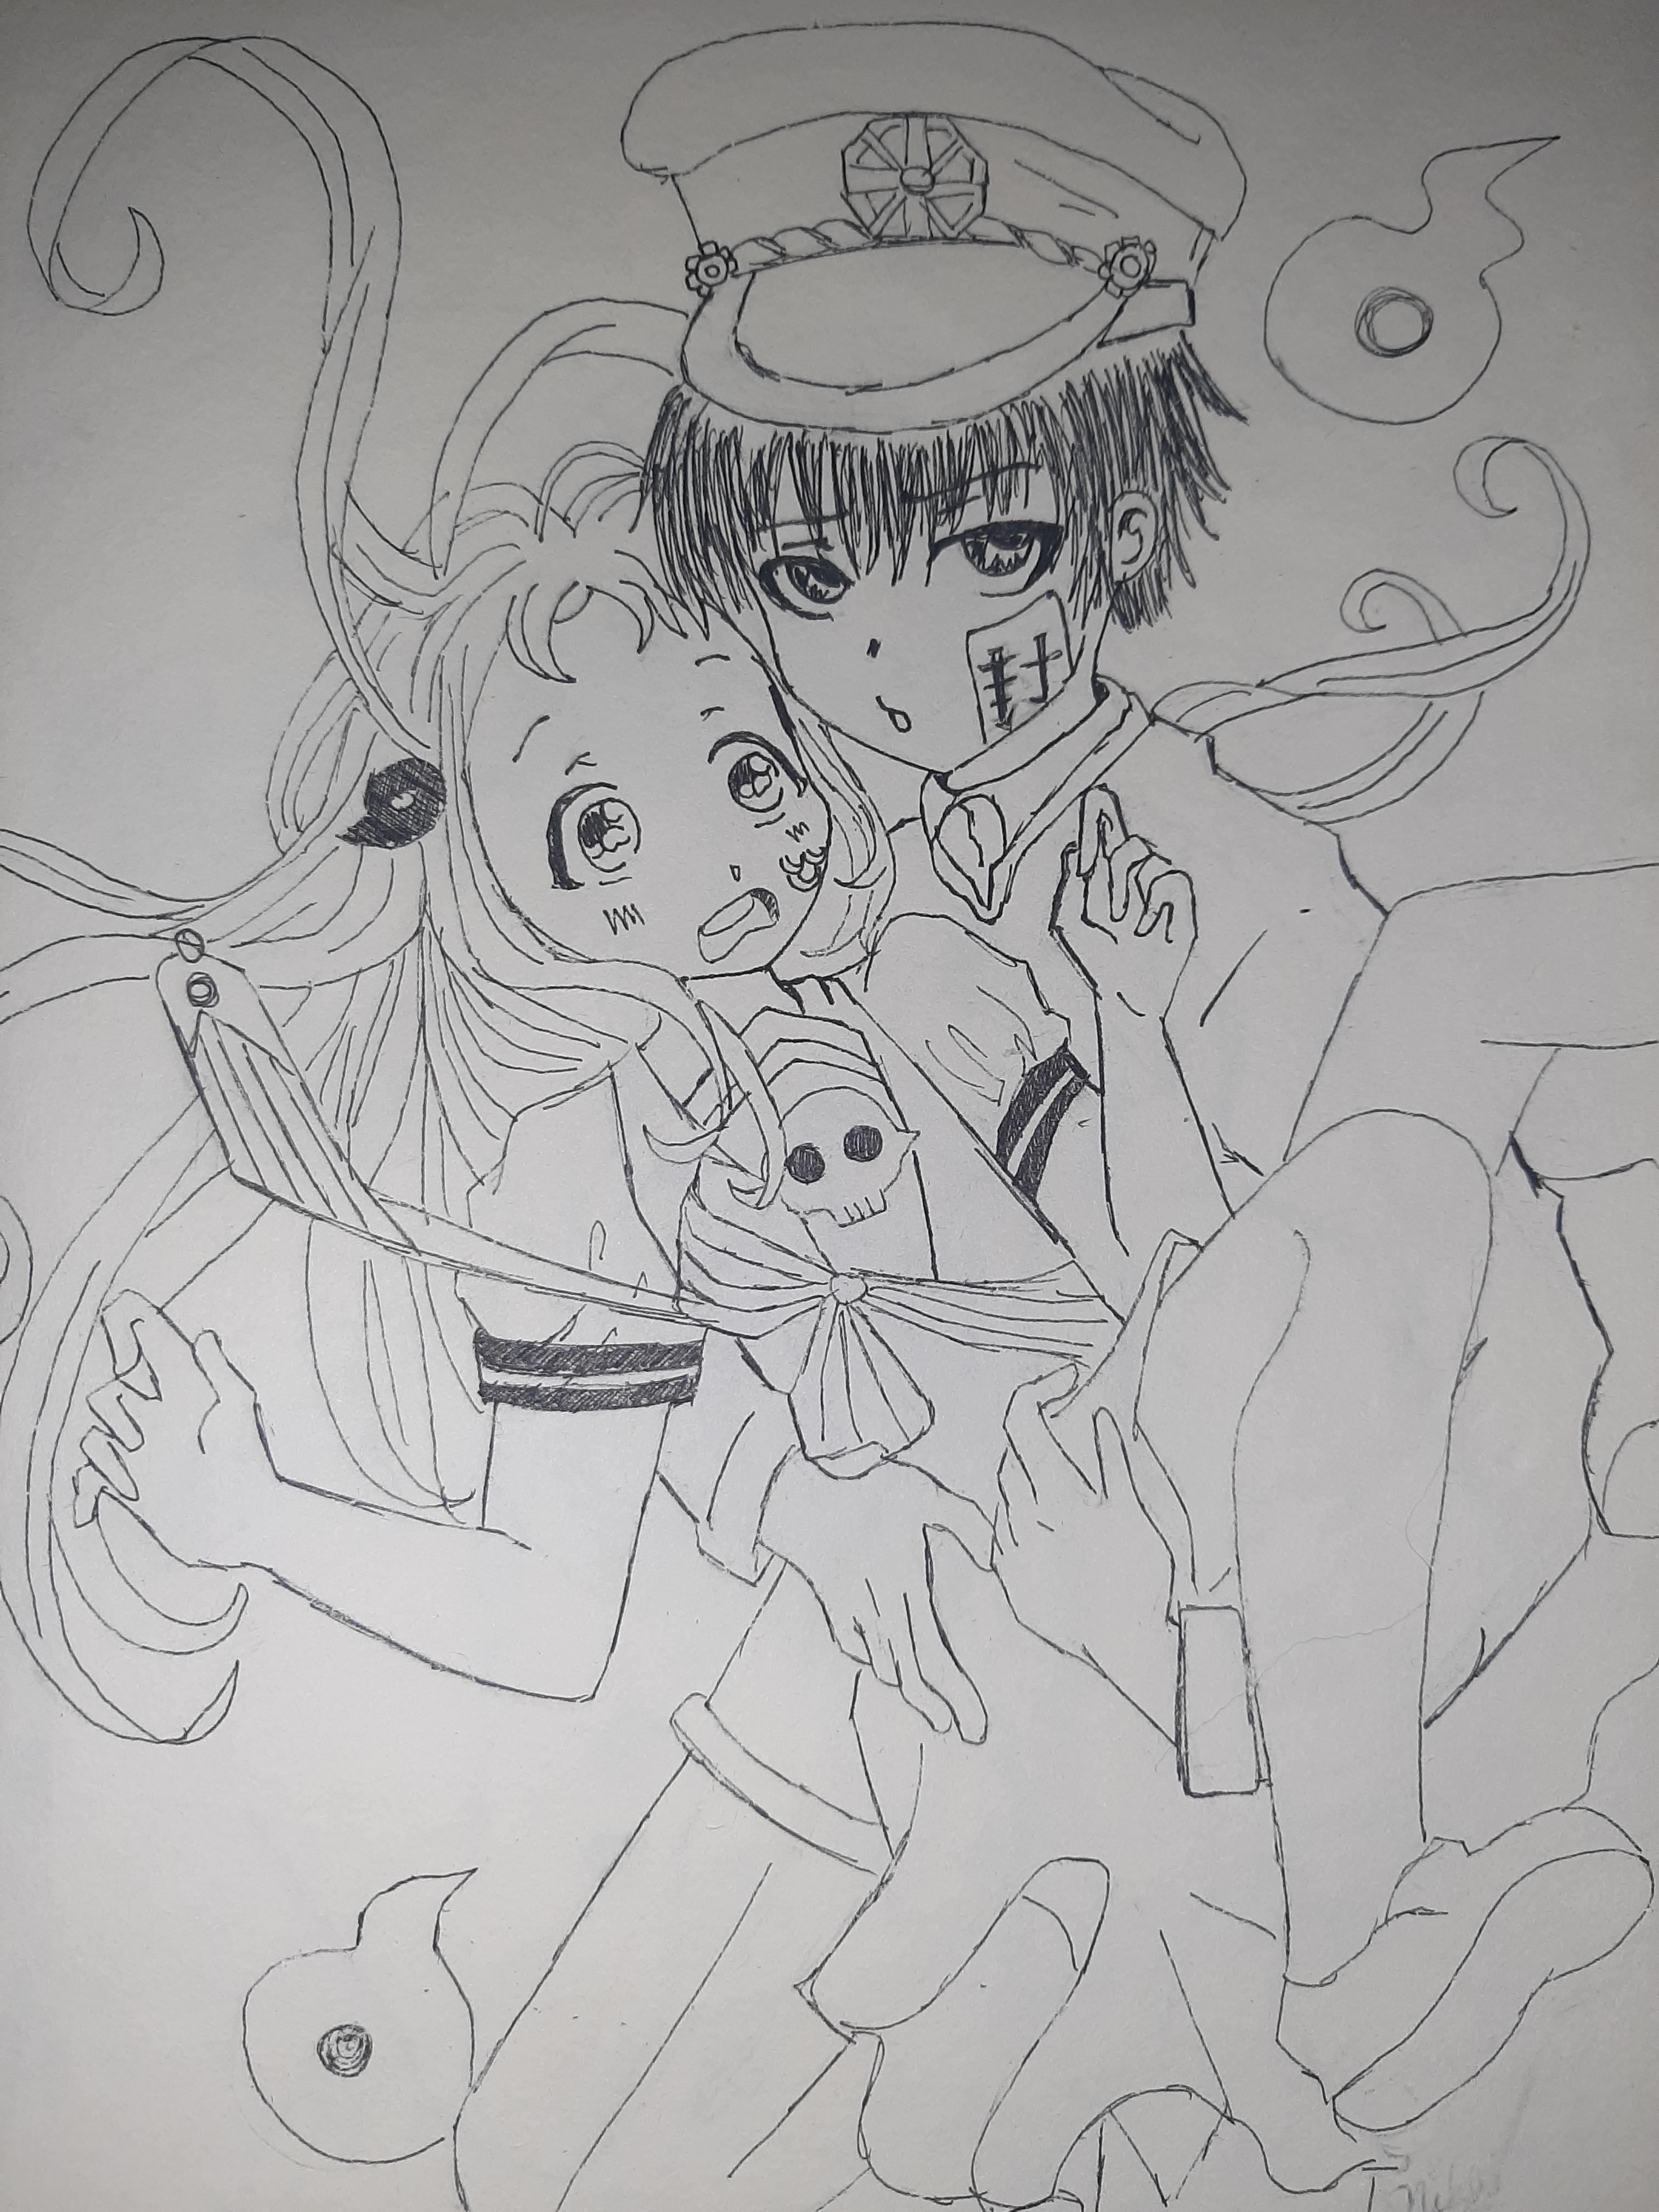 Other manga by the same author(s). Yashiro Nene And Hanako Manga Panel Hanakokun